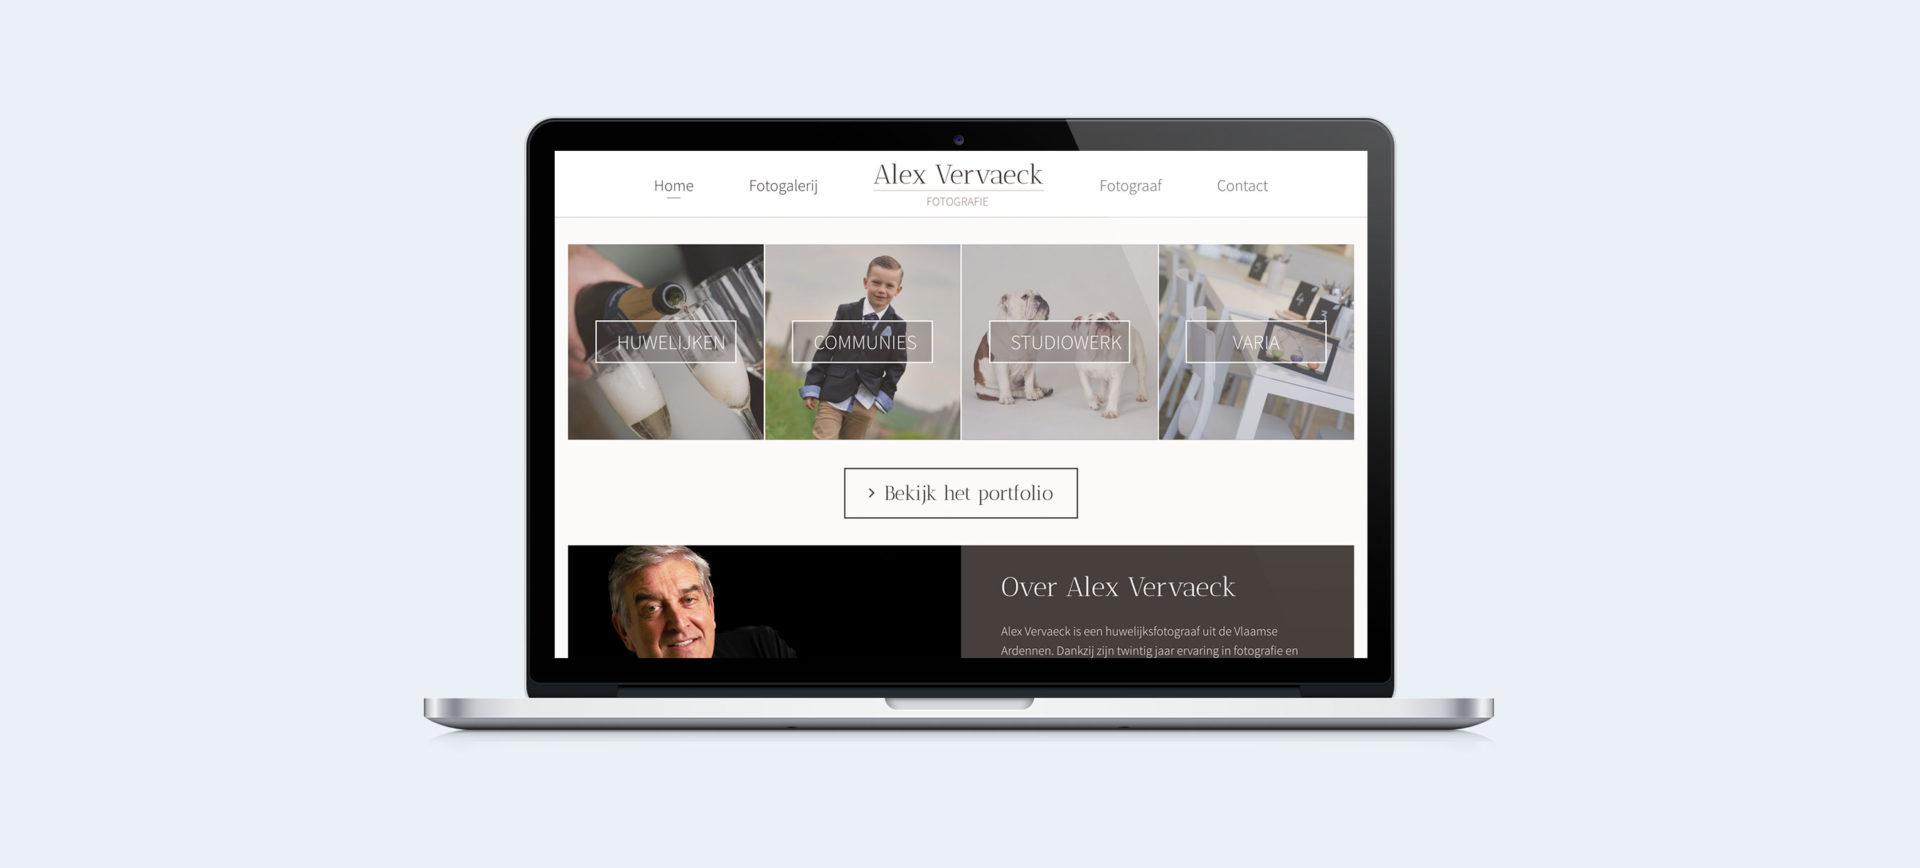 project-alexvervaeck-image_1